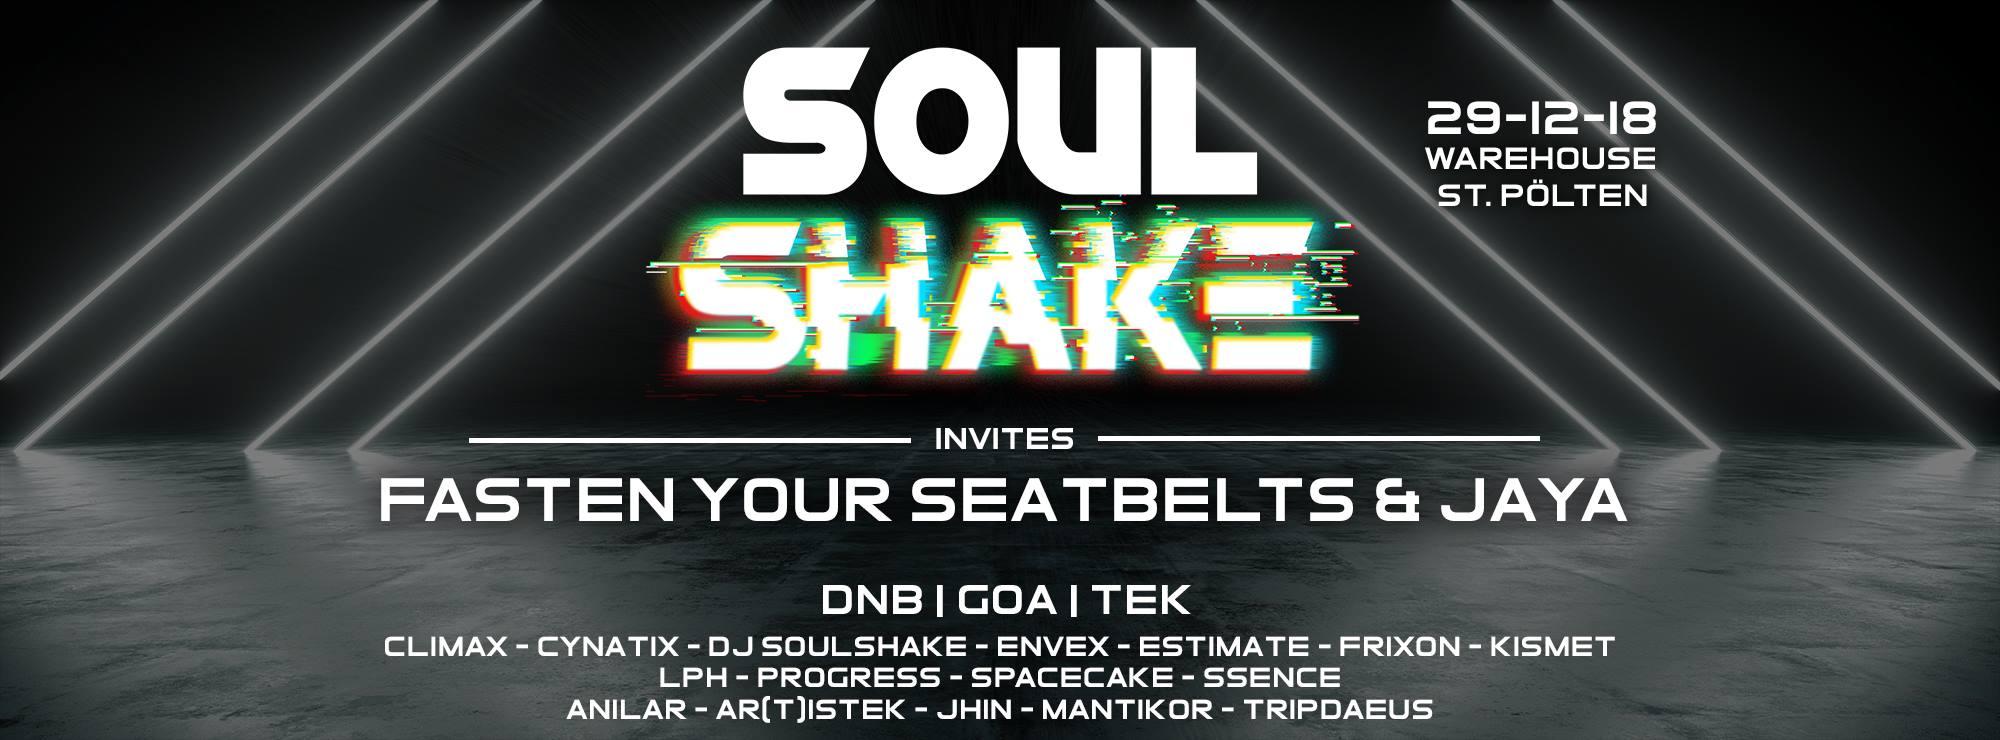 Soulshake invites Fasten Your Seatbelts & JAYA